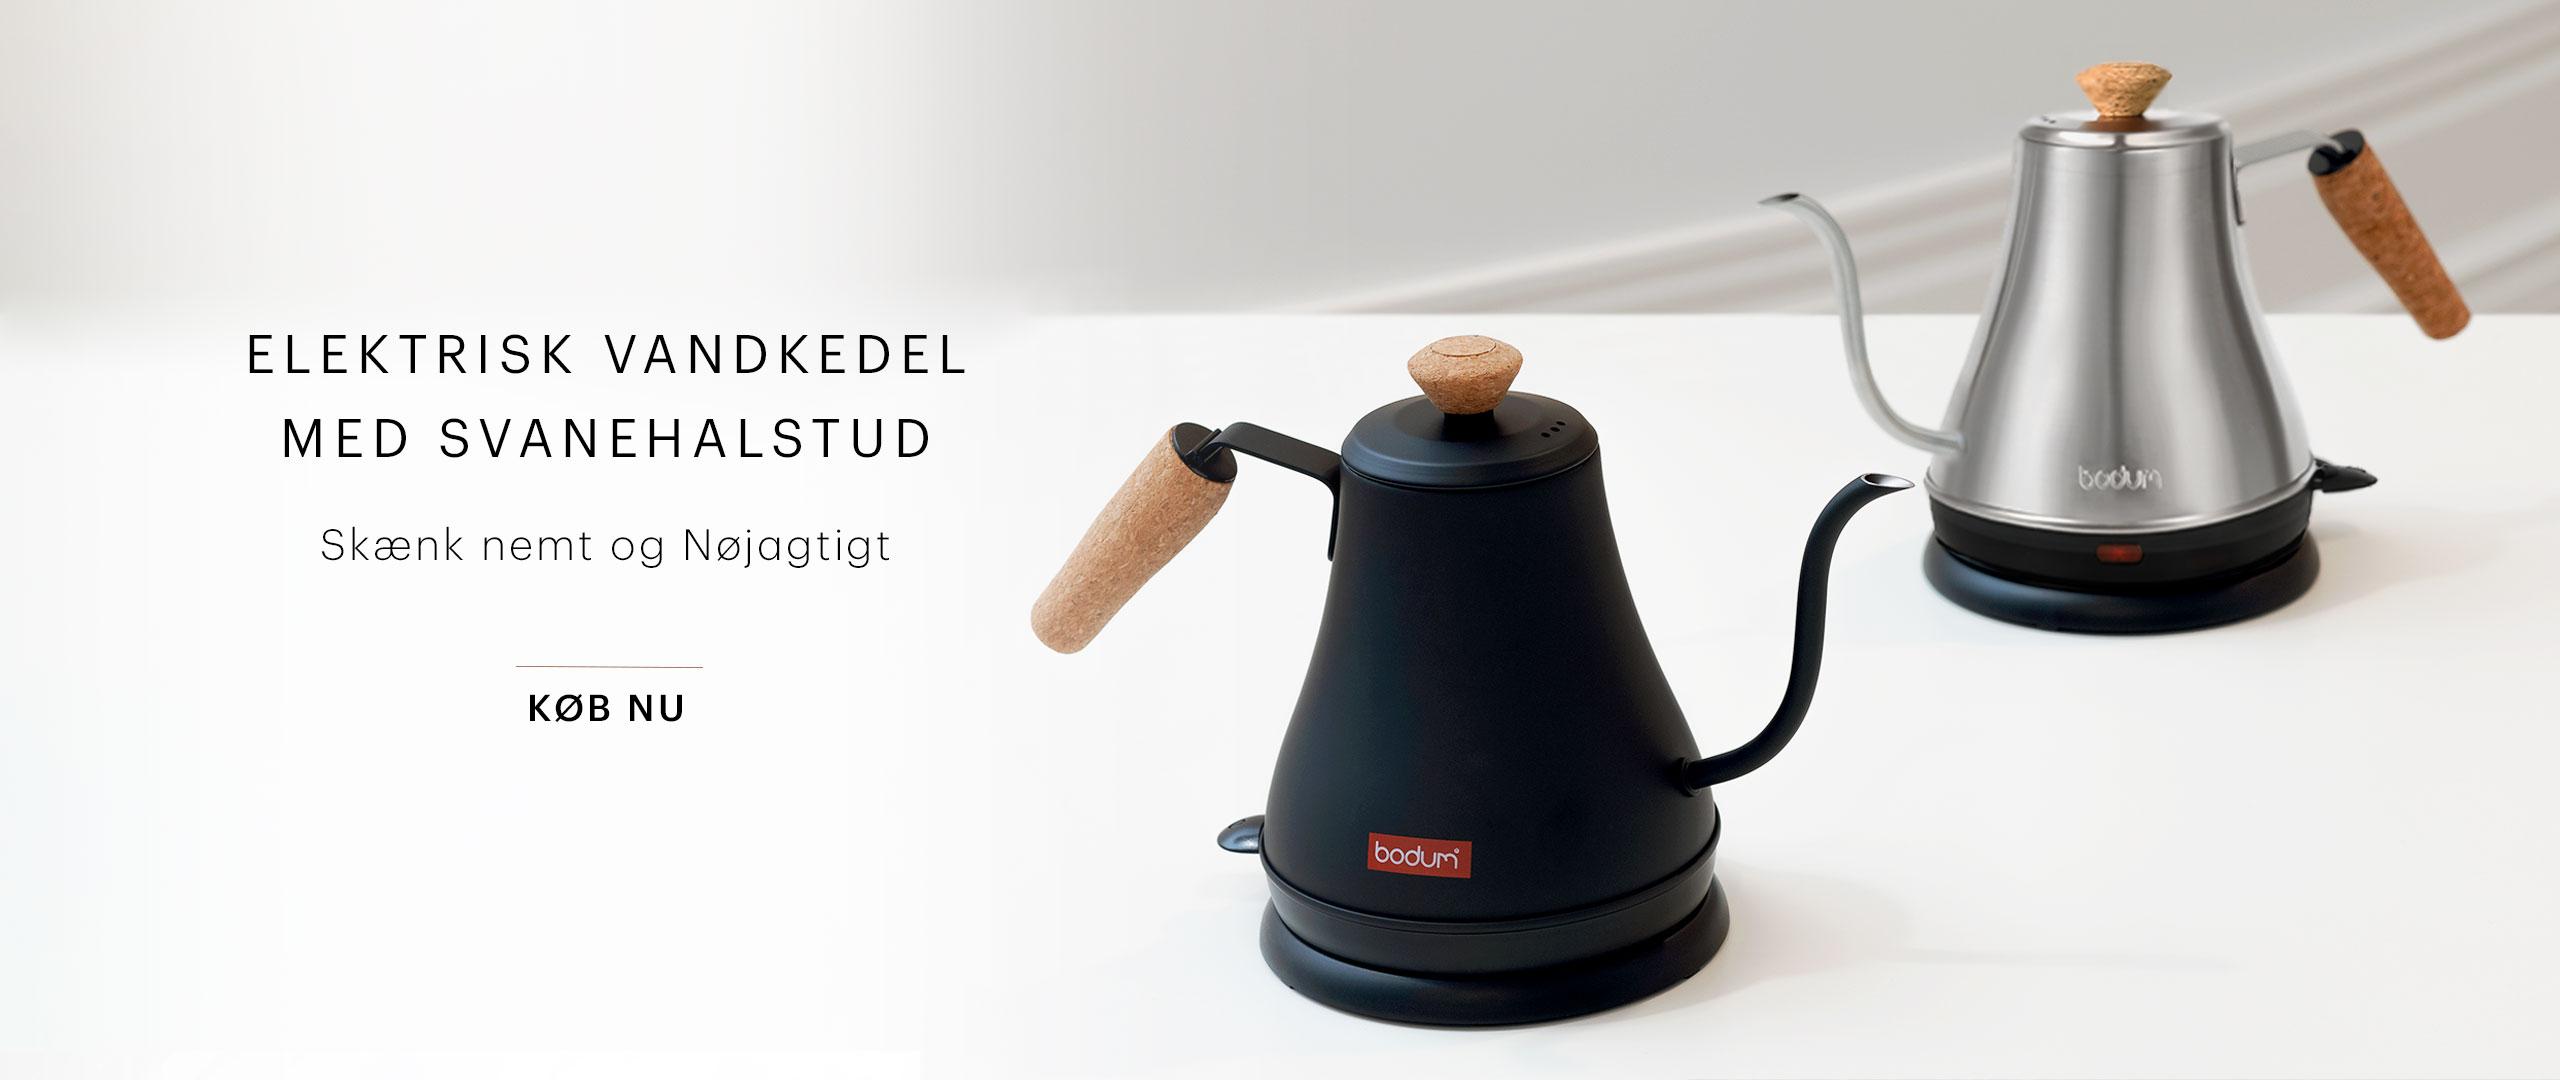 BEU [DK] - Gooseneck